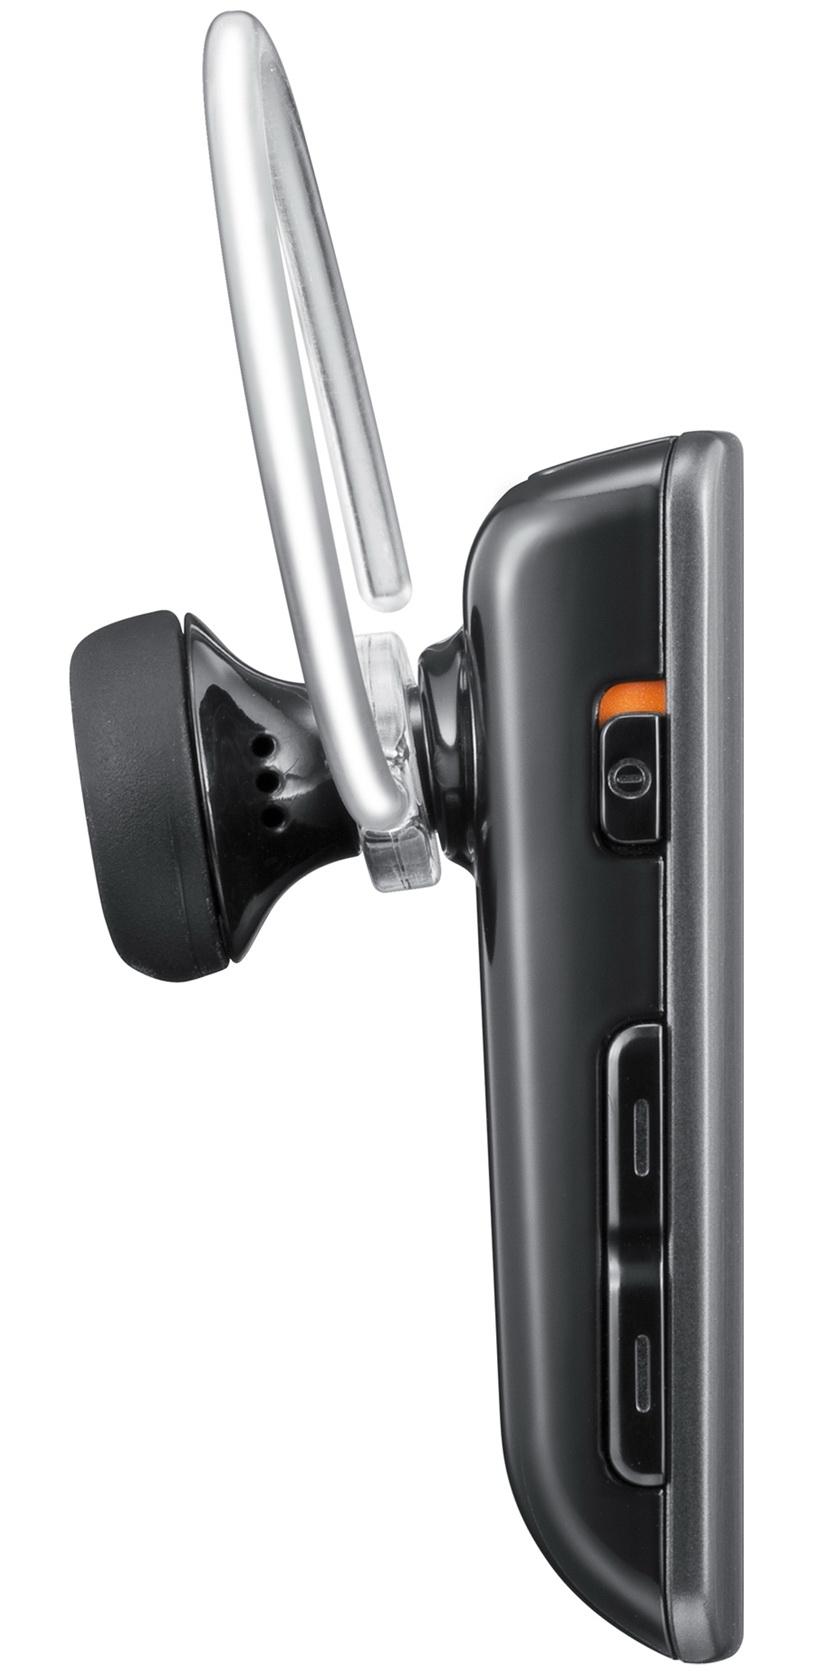 Bluetooth-гарнитура Samsung HM1700 Black (BHM1700EDECSEK) - 1